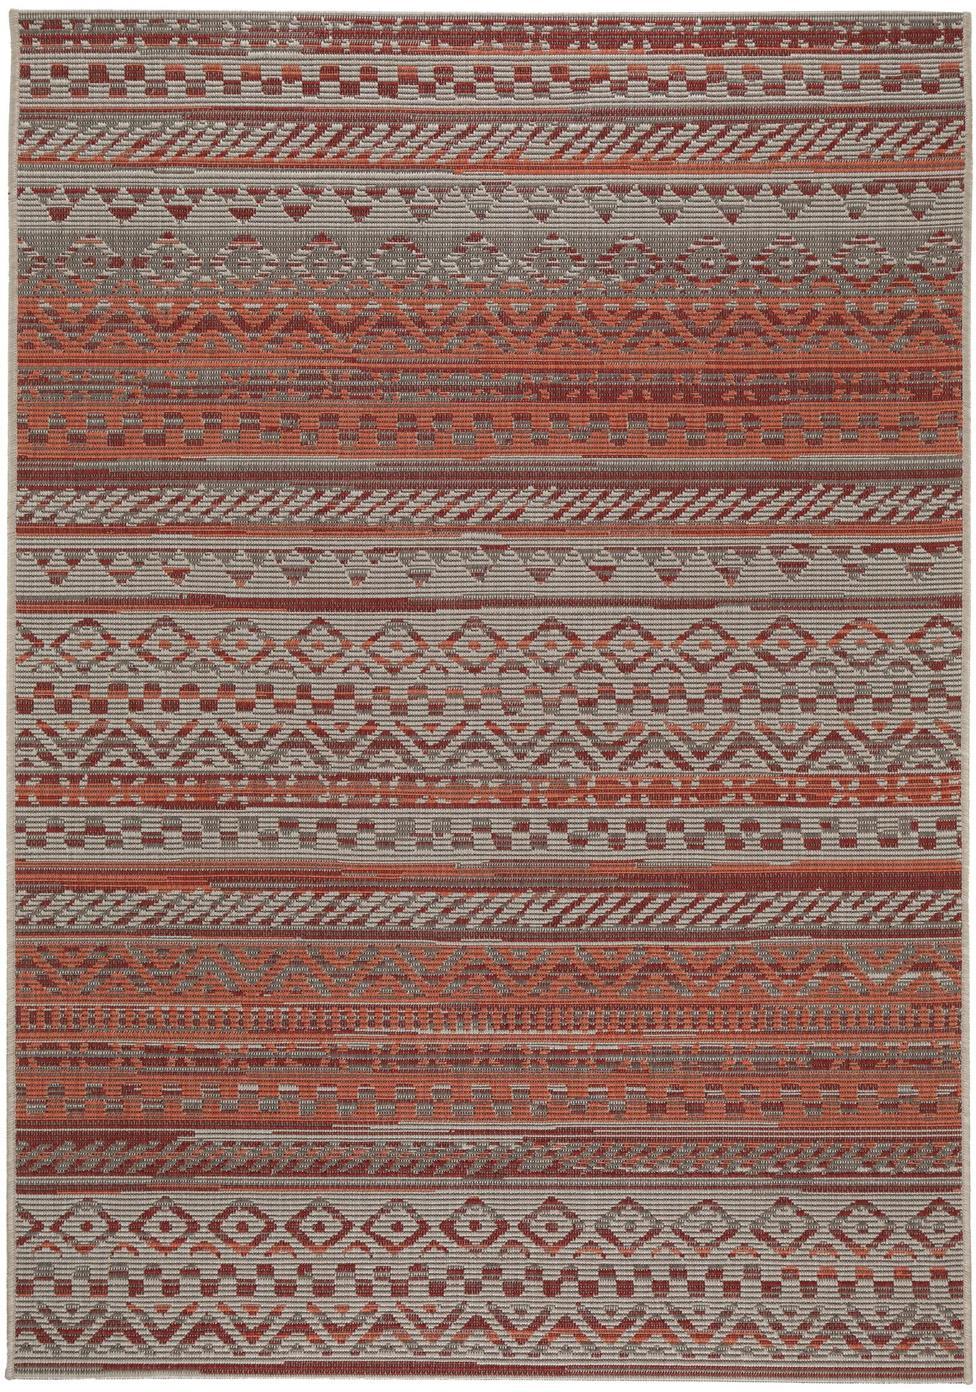 In- & Outdoor-Teppich Carina, 100% Polypropylen, Rot, B 80 x L 150 cm (Größe XS)